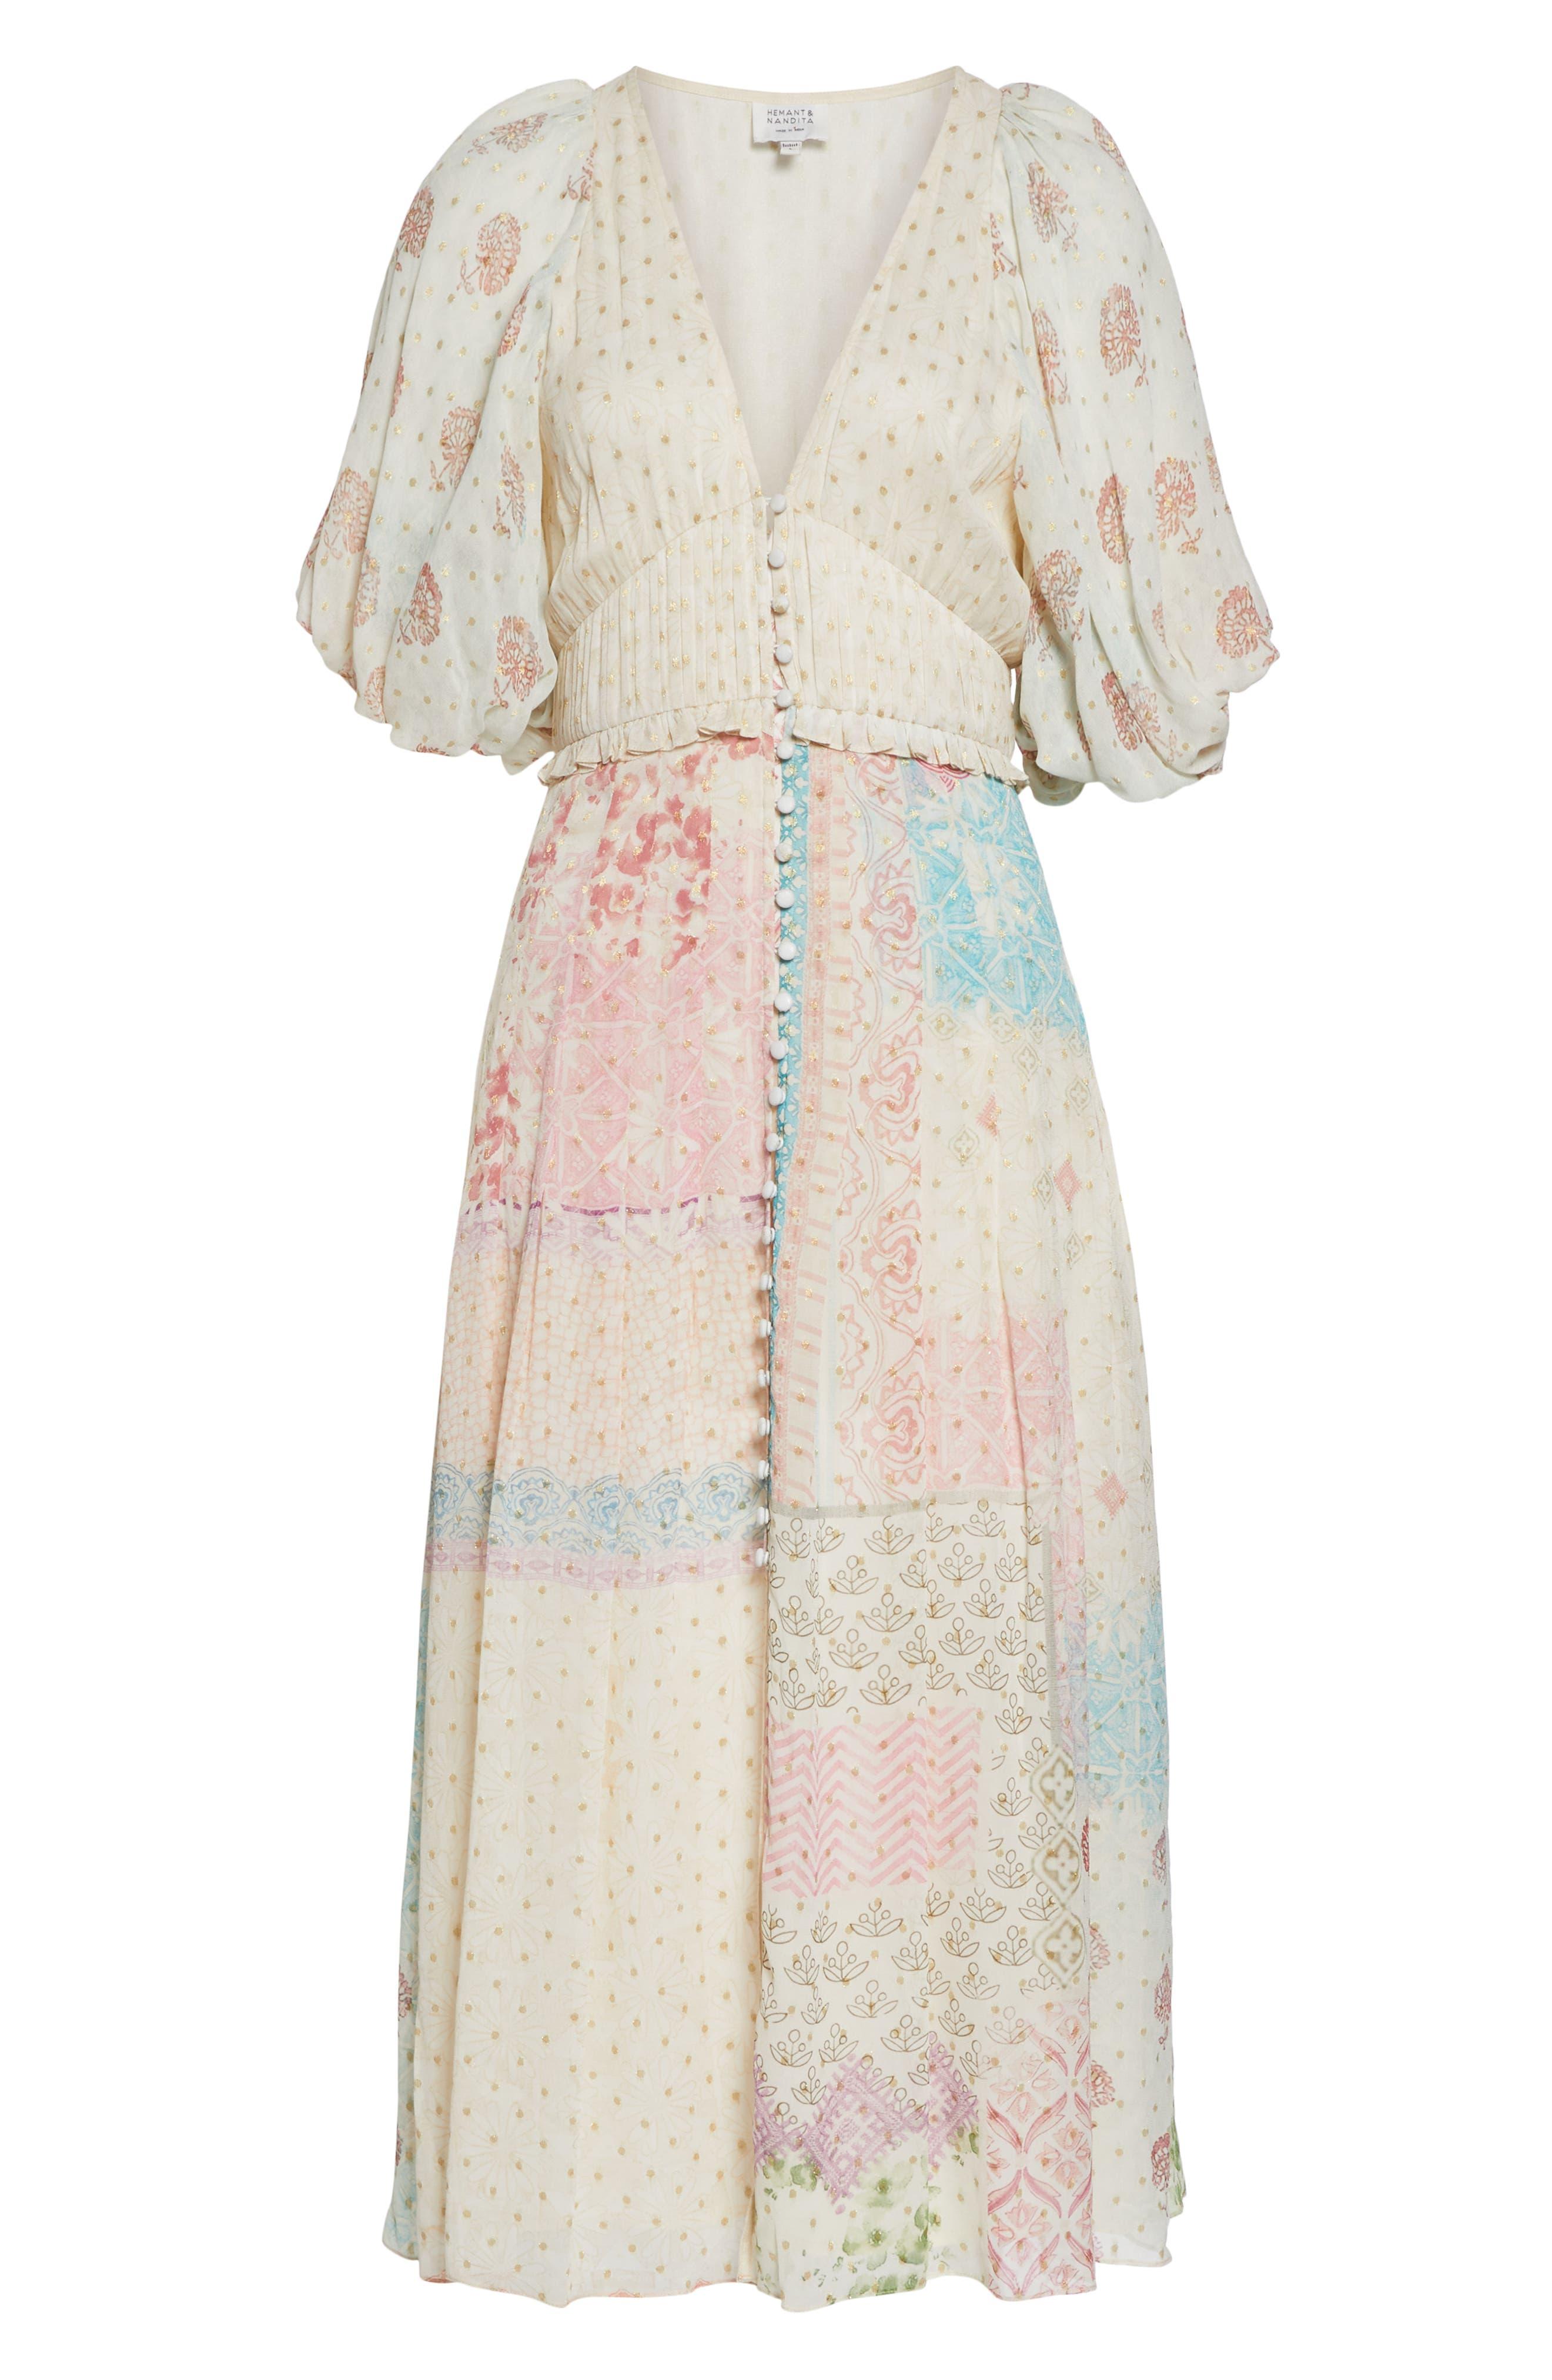 HEMANT & NANDITA, Cover-Up Maxi Dress, Alternate thumbnail 6, color, PASTEL